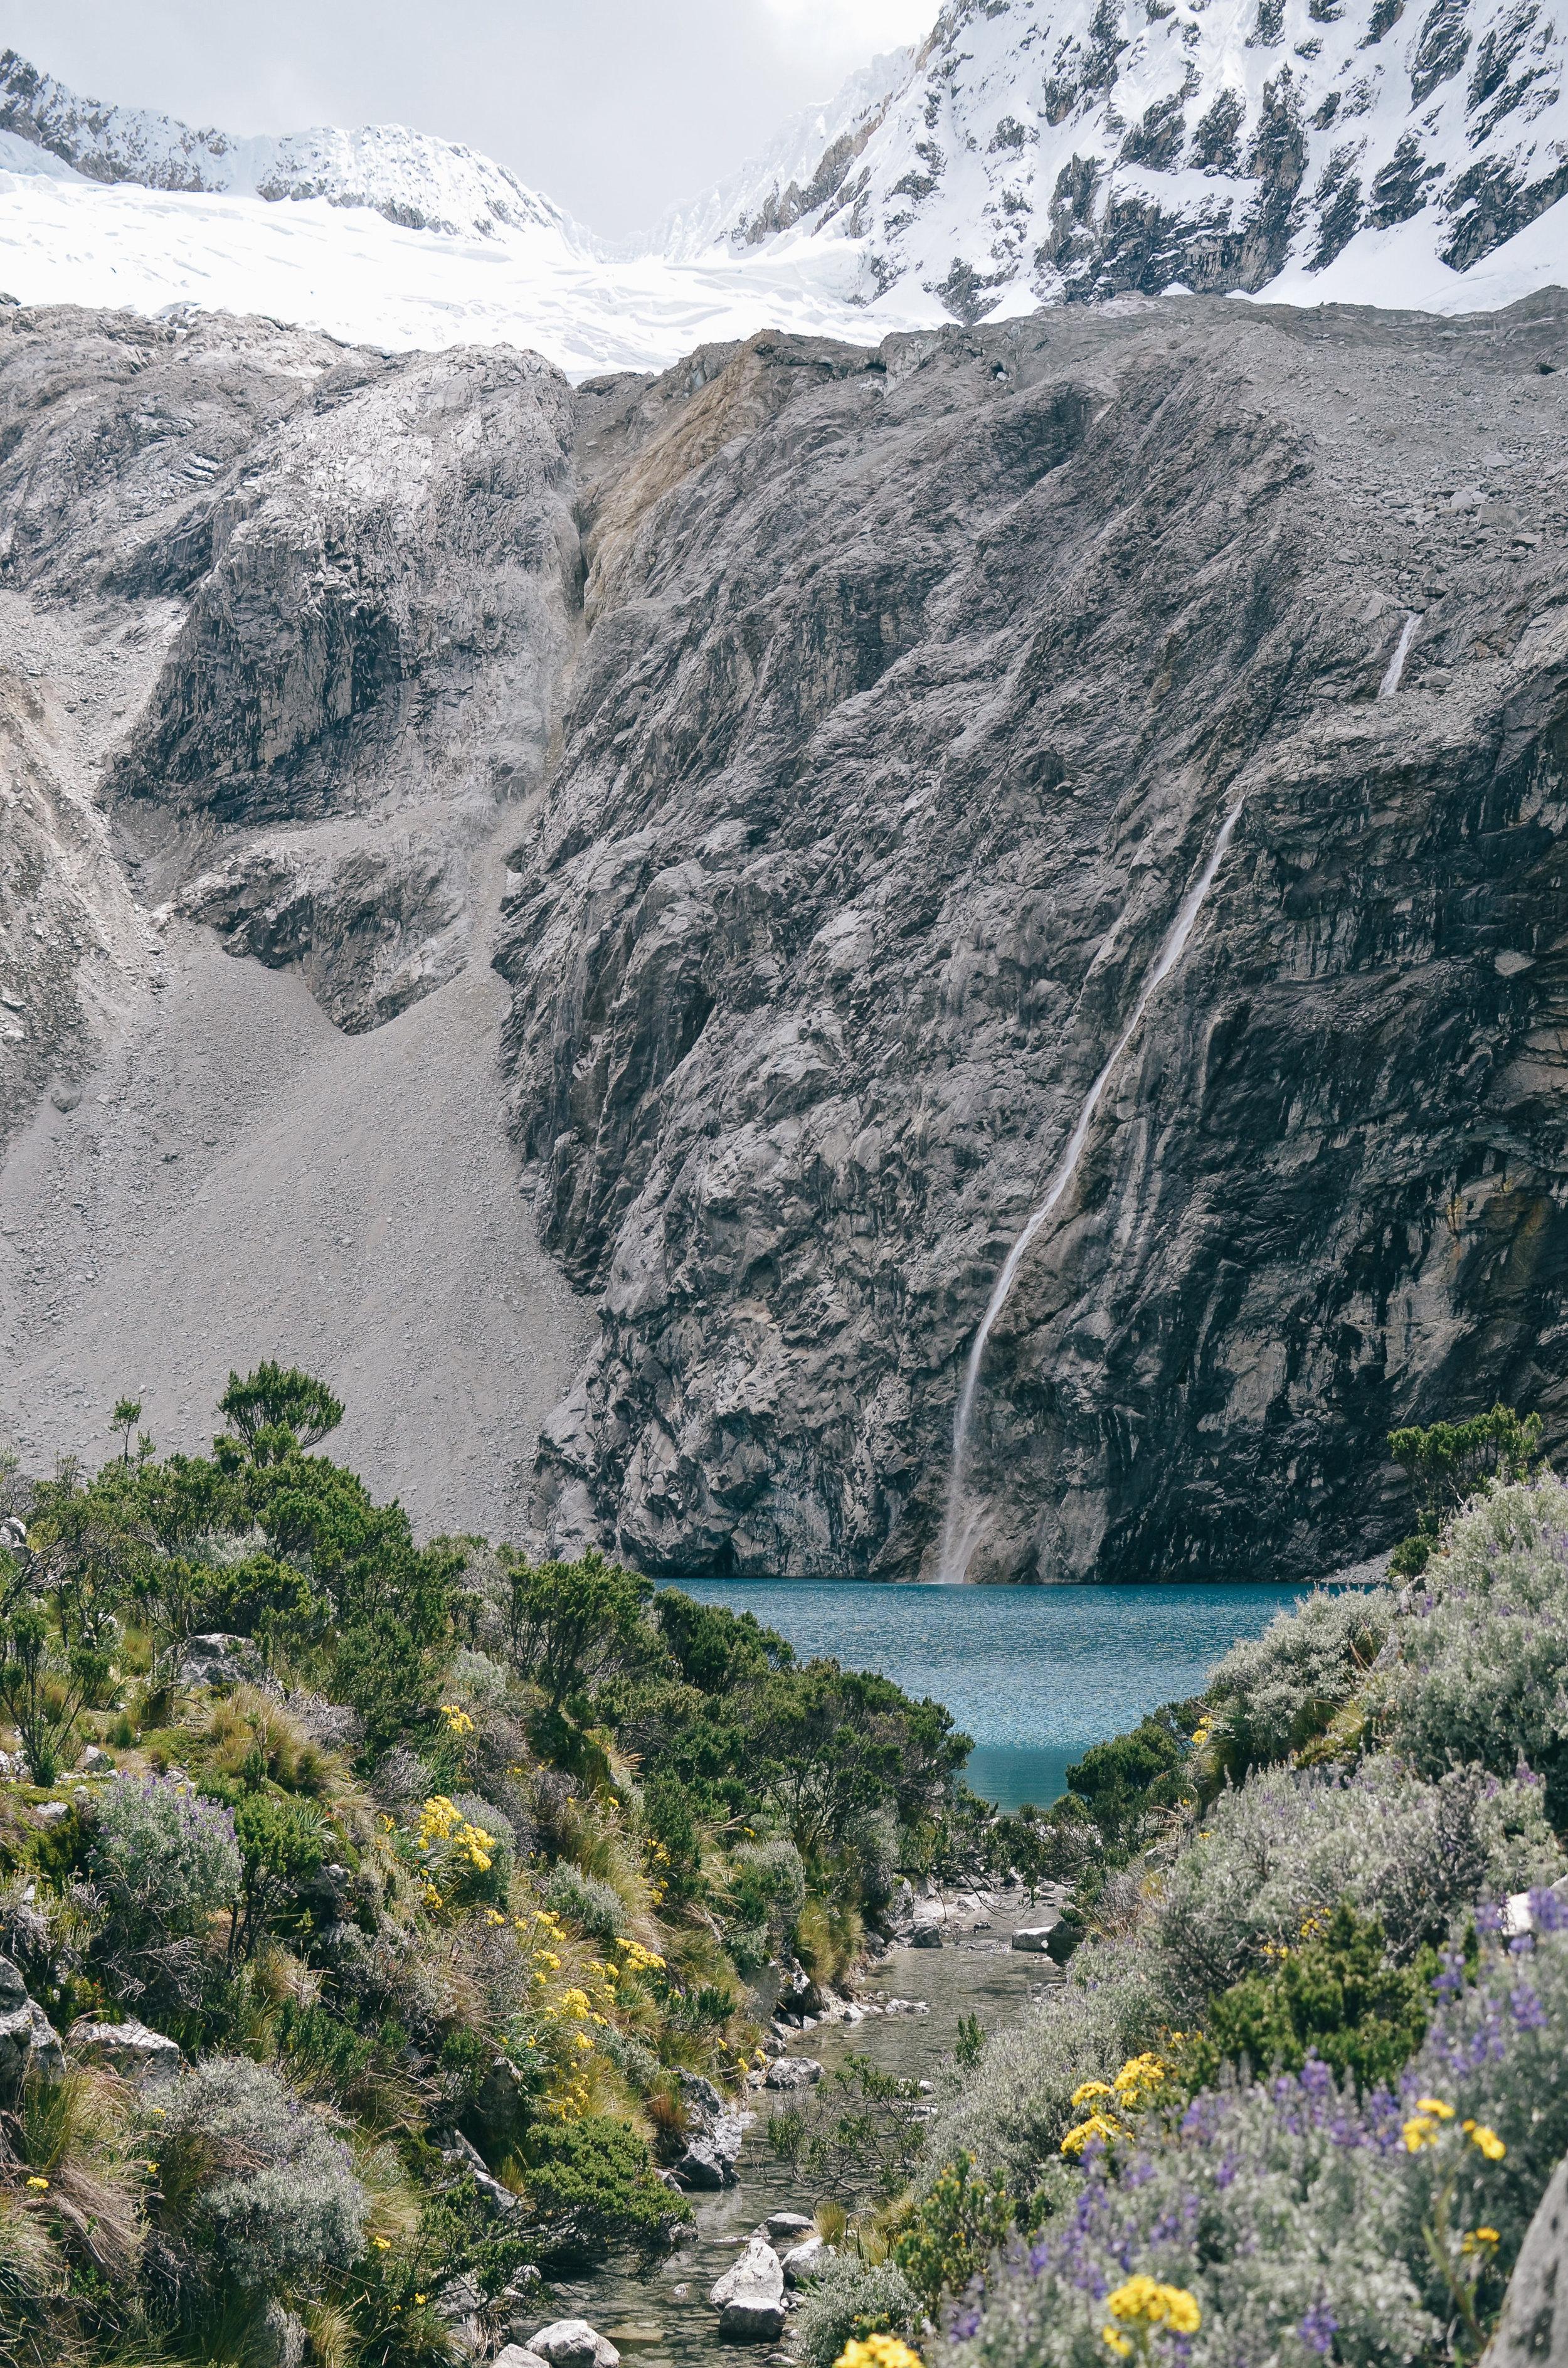 laguna+lake+69+hike+peru+travel+guide+life+on+pine_DSC_0522.jpg